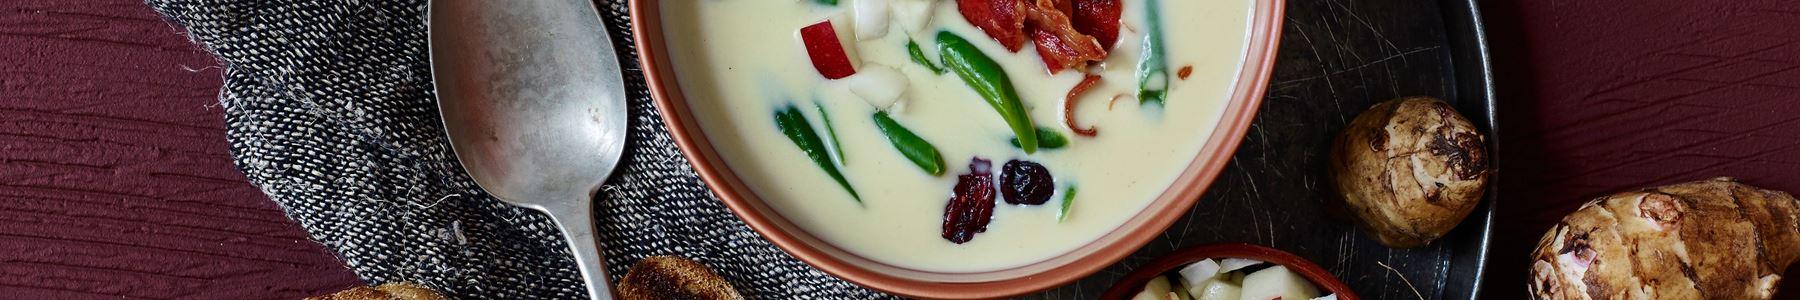 Tranebær + Varme supper